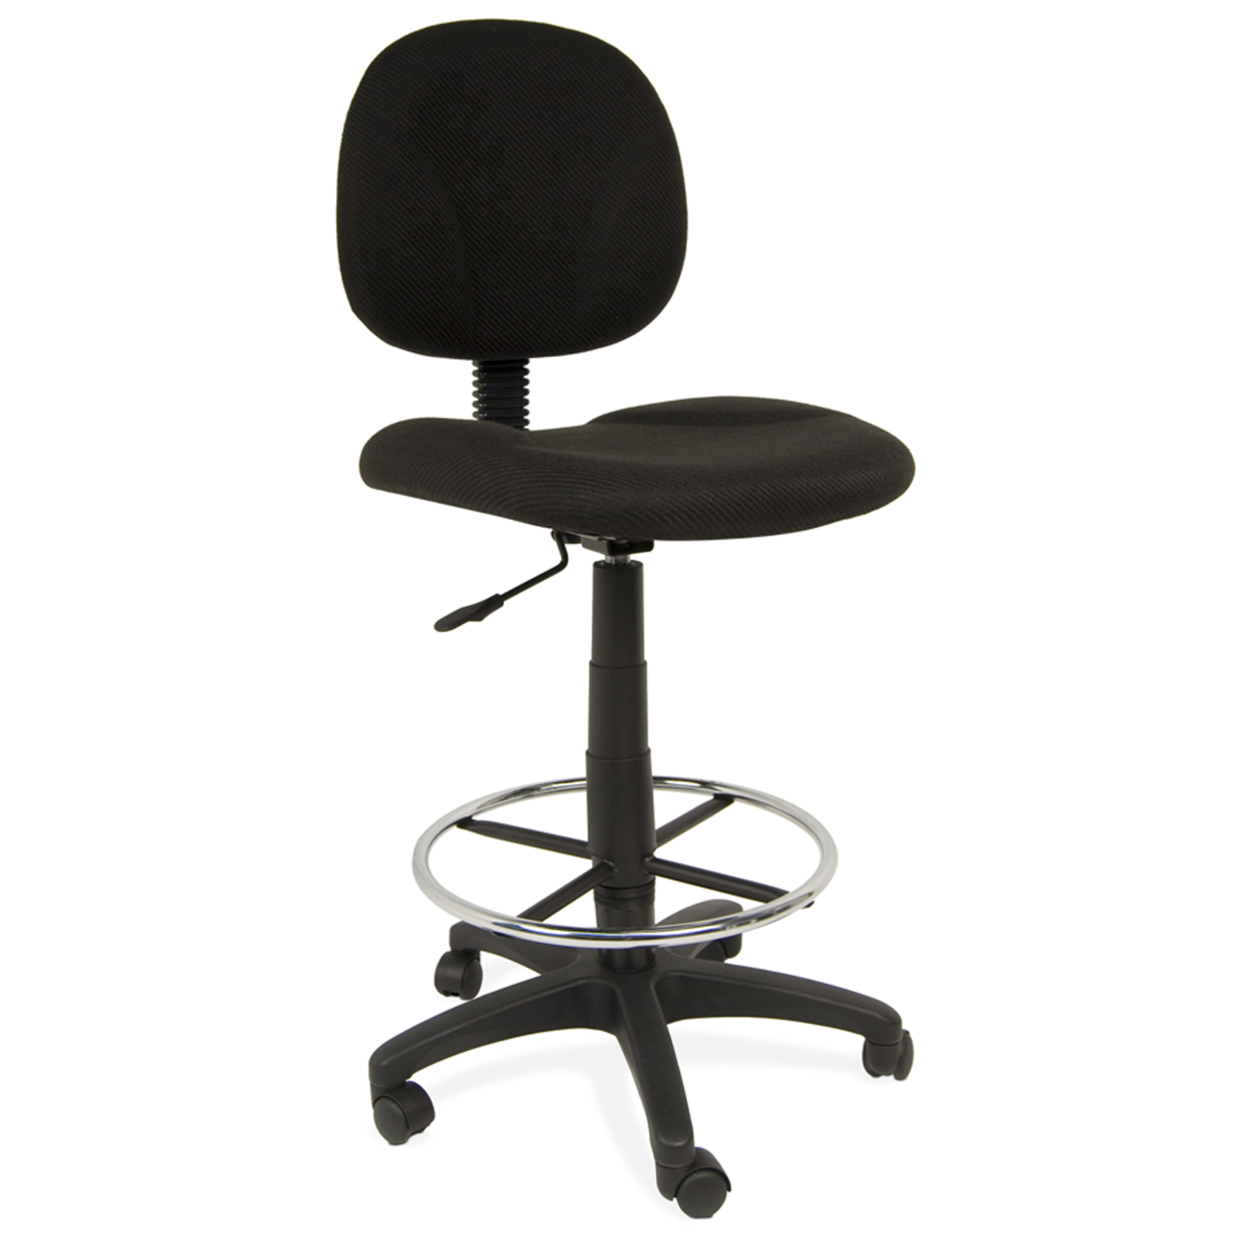 Offex Home Office Ergo Pro Chair - Black offex home office plinth ottoman latte